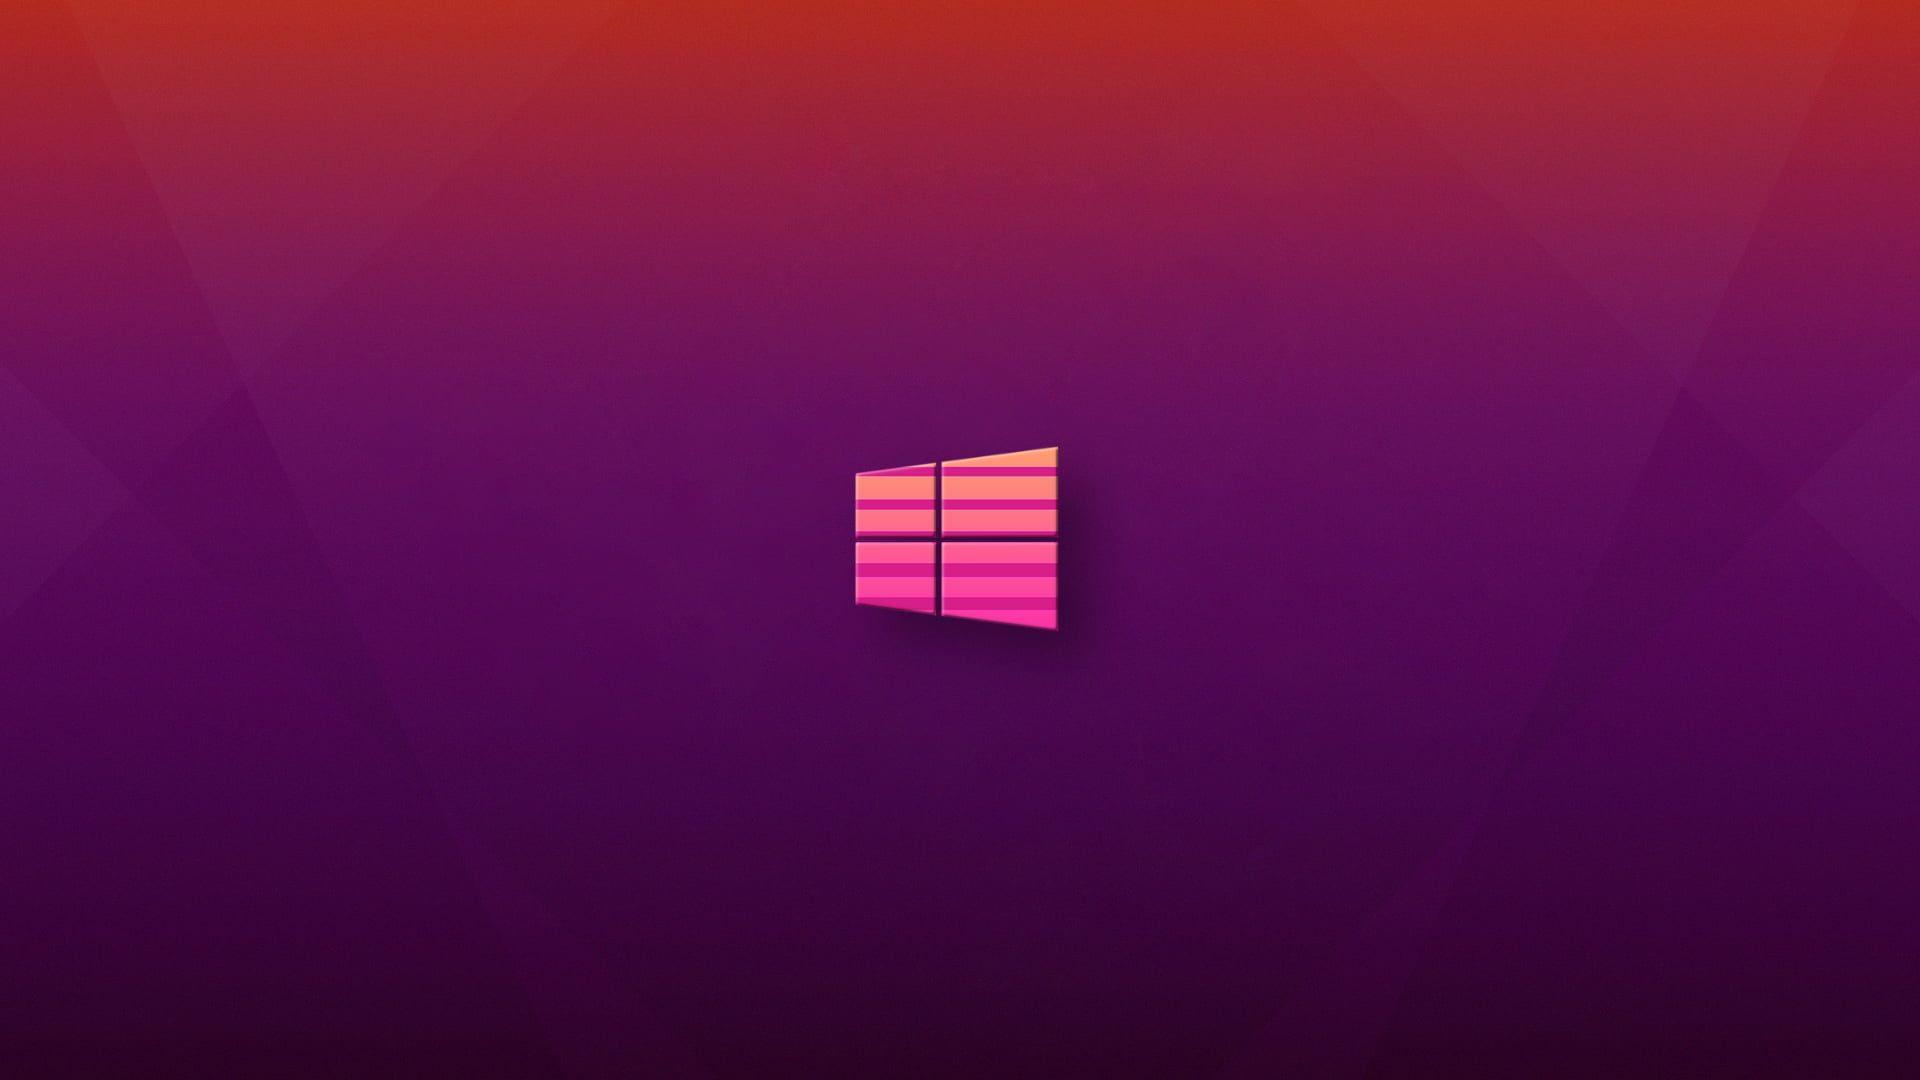 Windows 10 Logo Pink Purple Background Purple Vaporwave 1080p Wallpaper Hdwallpaper Deskt Purple Backgrounds Pink Led Lights Pink And Purple Background